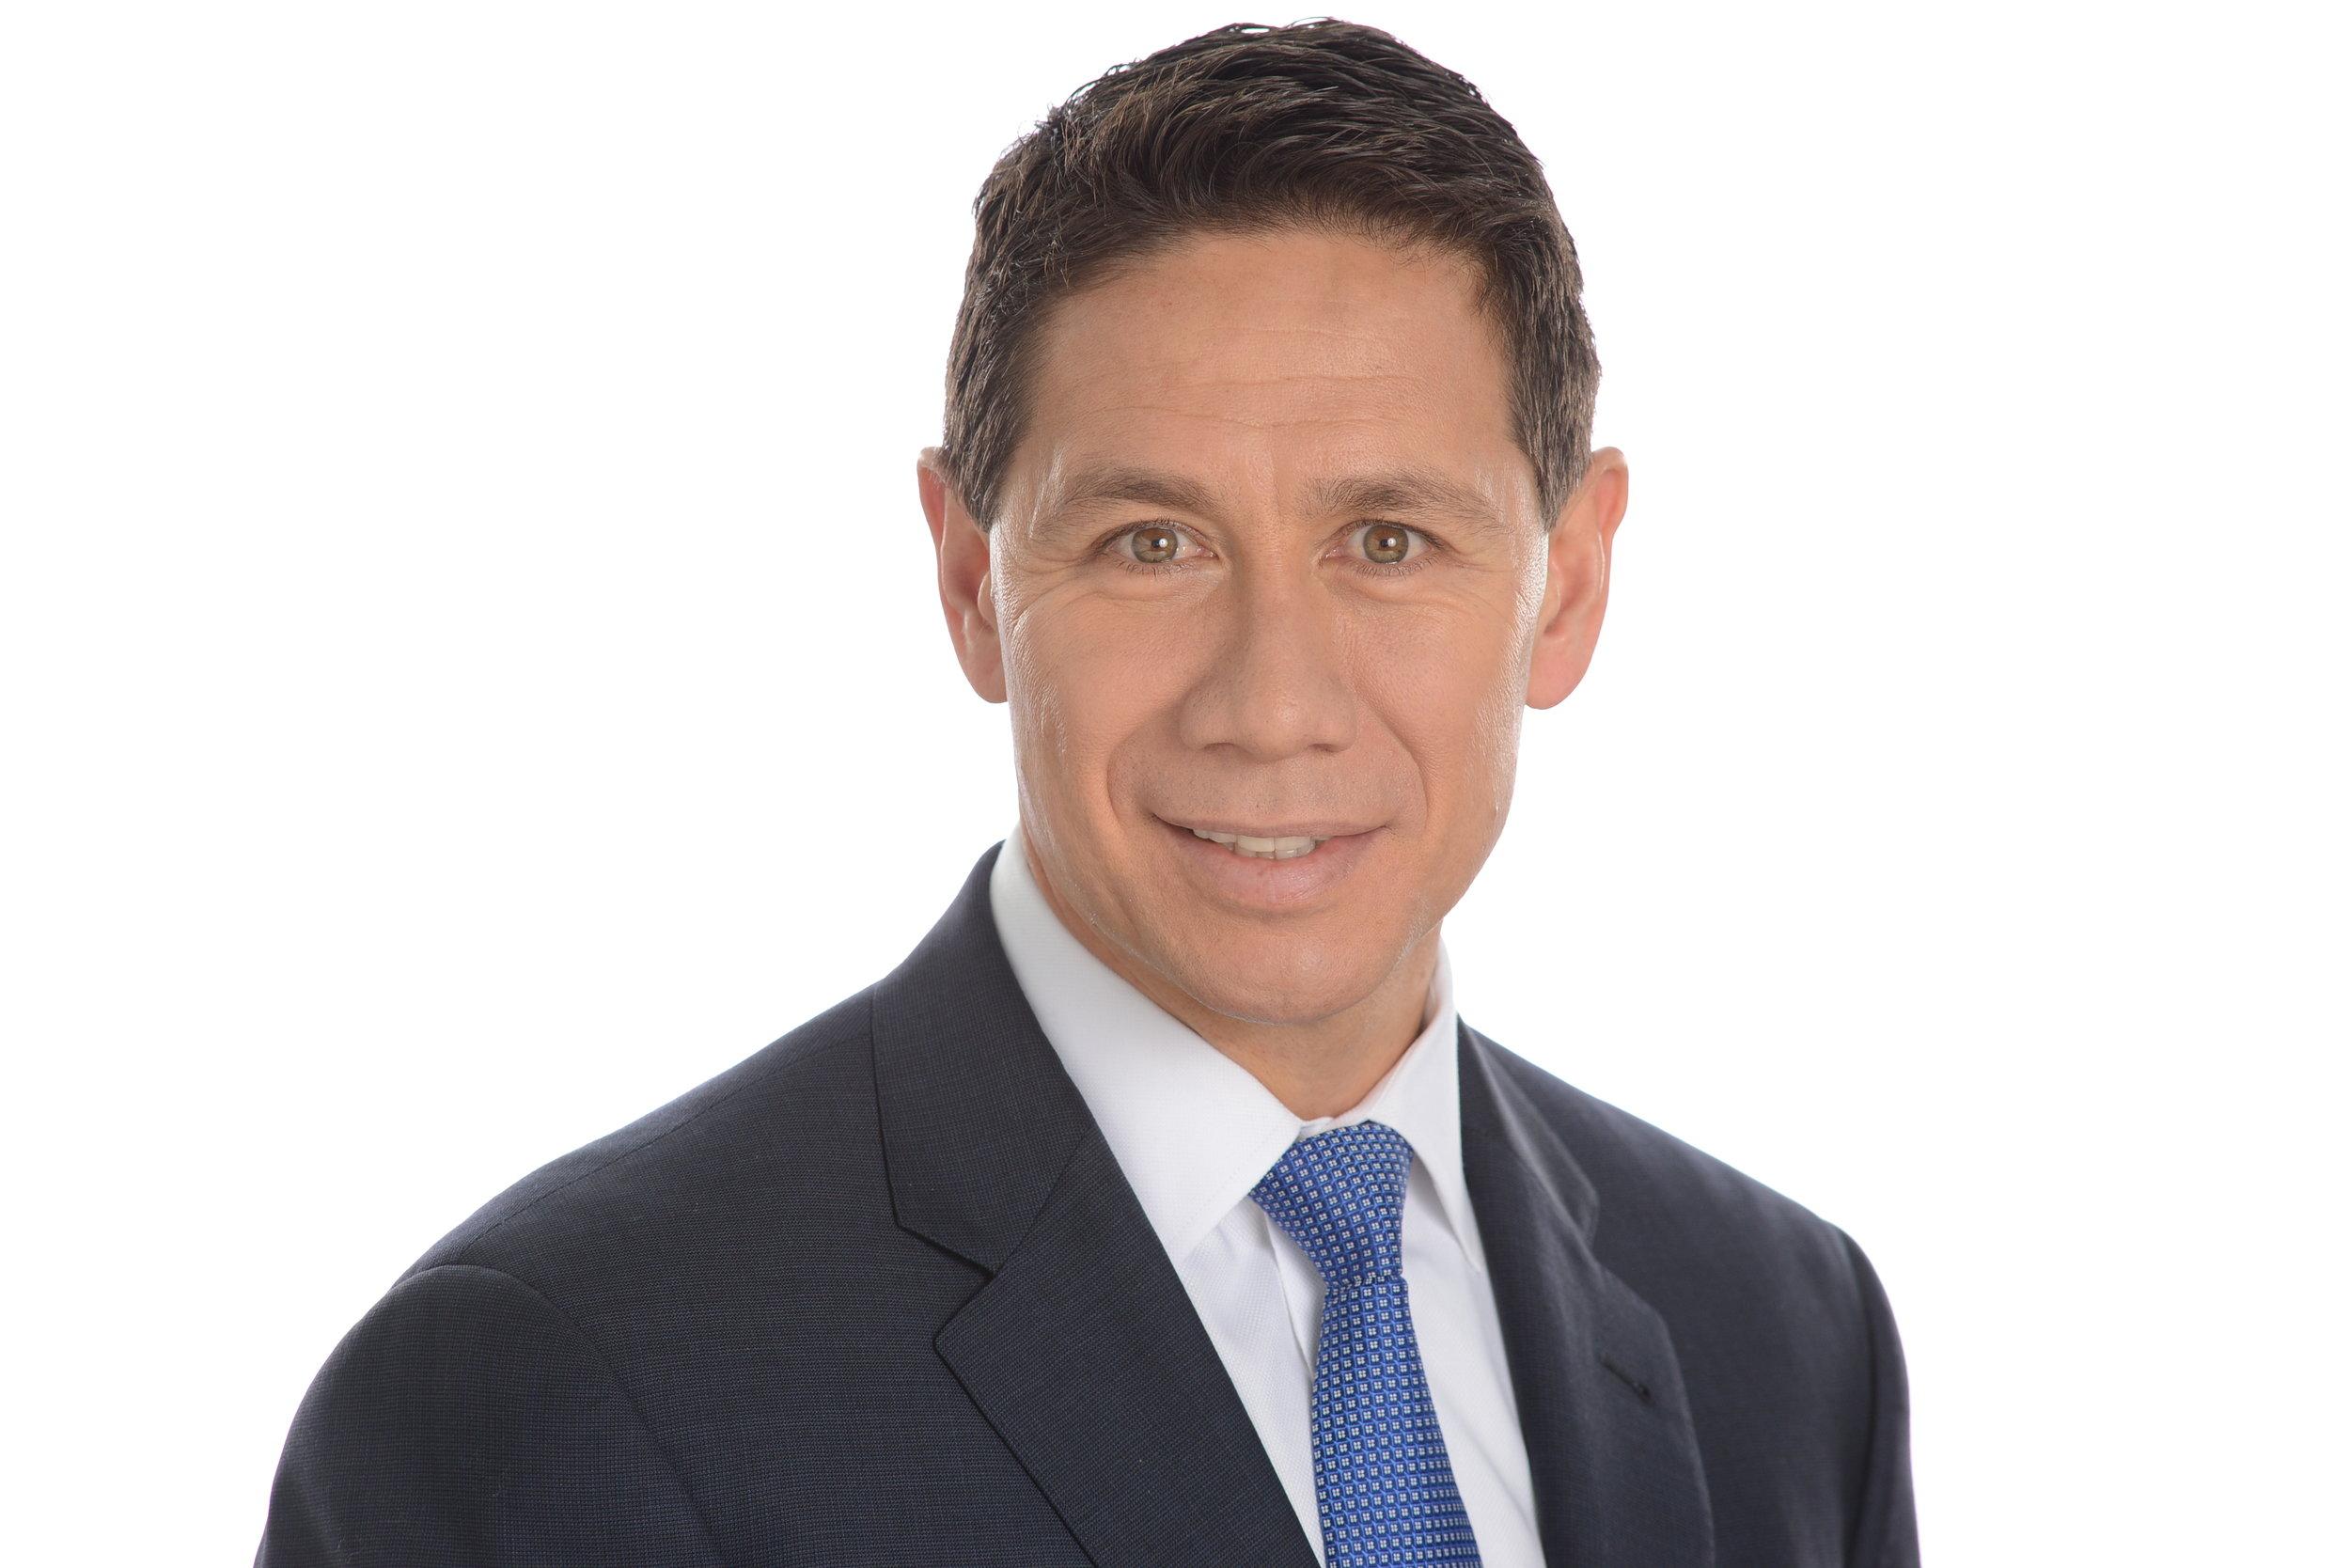 Tony Sanchez, VP, Customer Experience @ Comcast